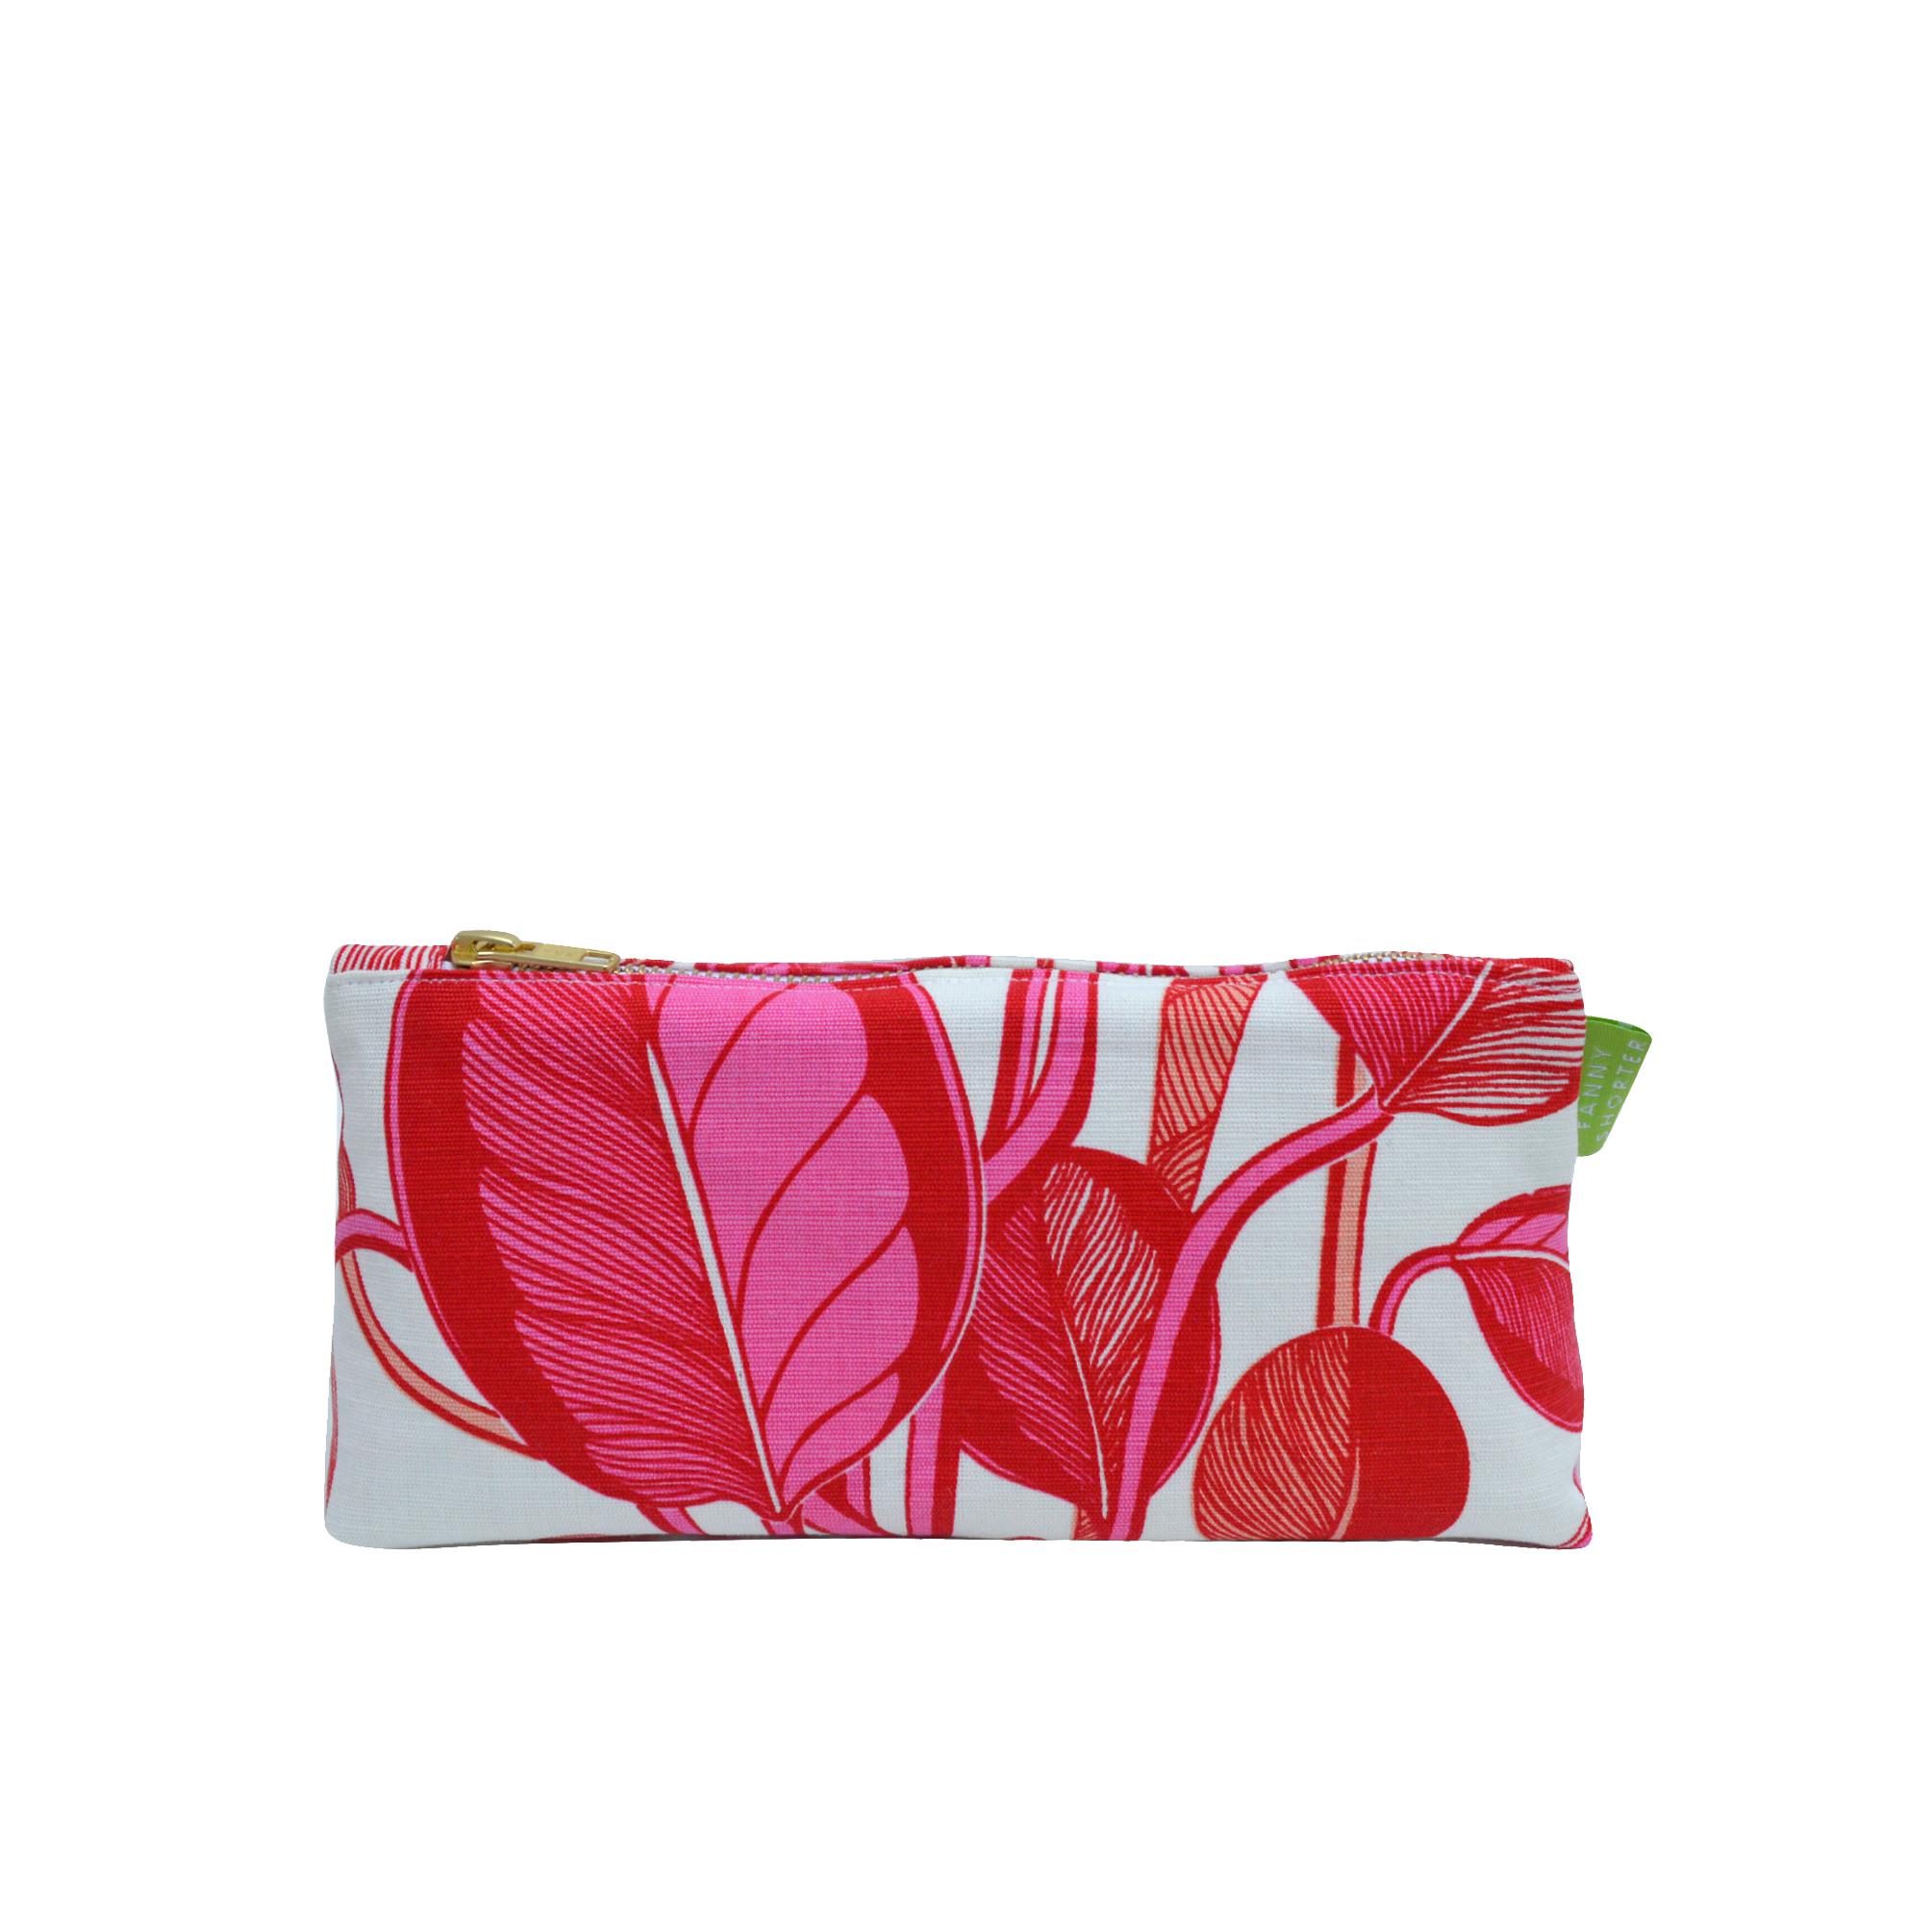 CALATHEA Small Cosmetics Bag | Coral